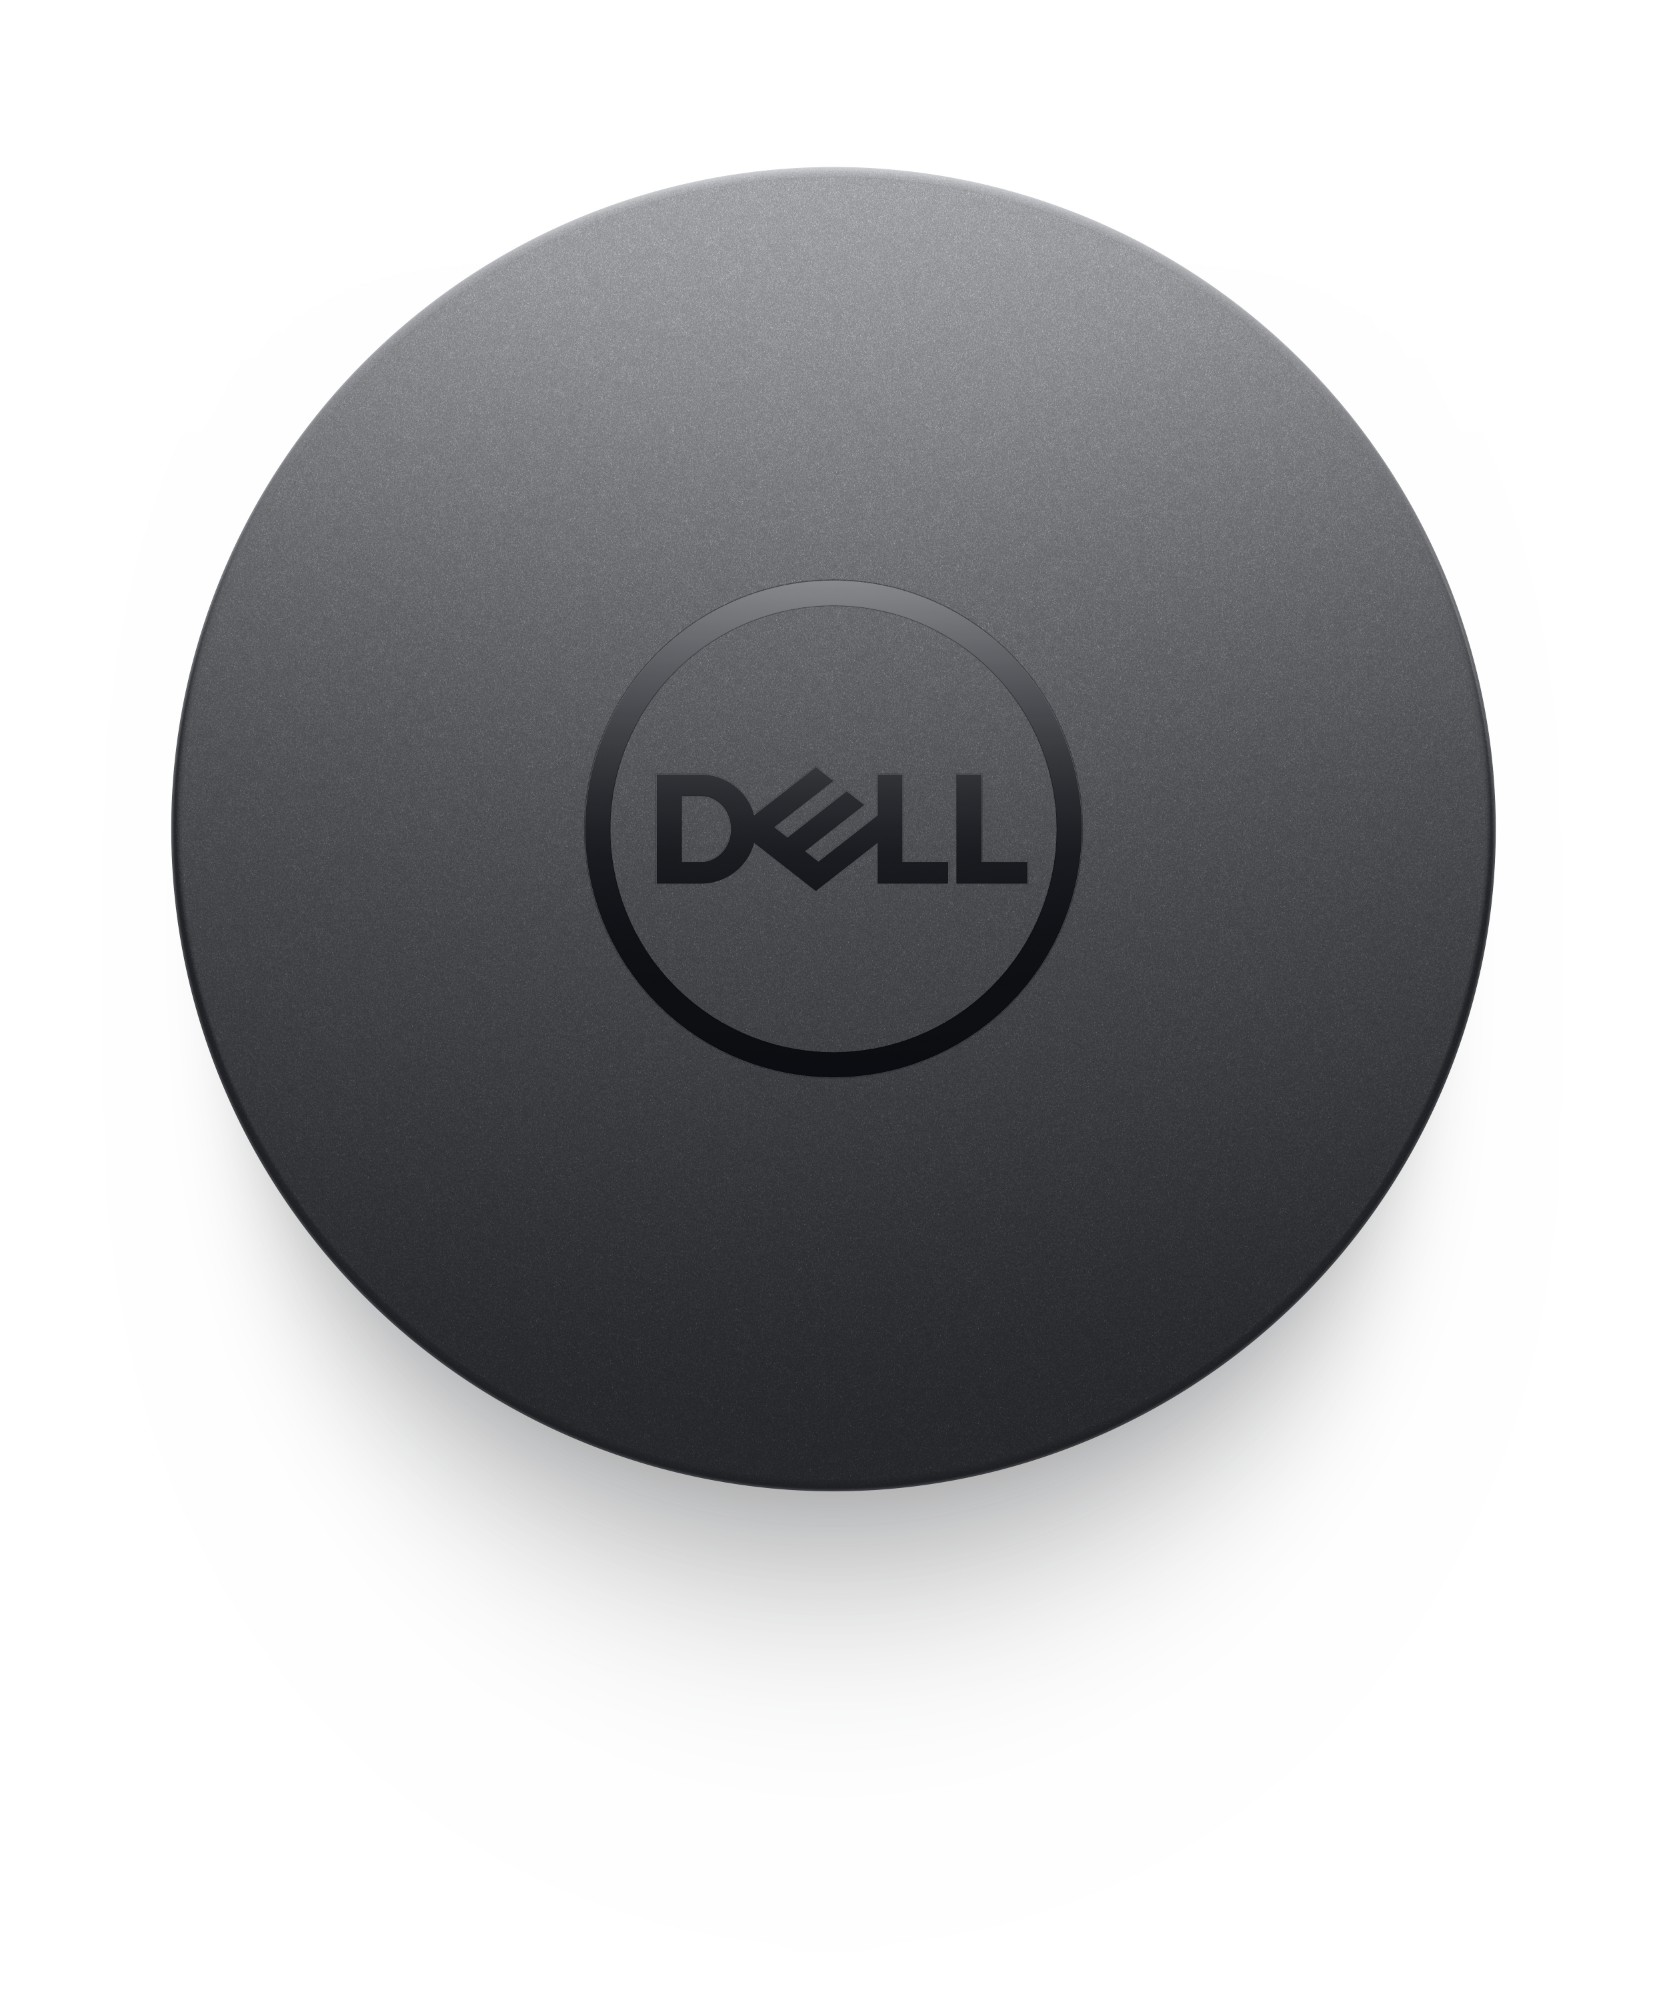 DELL DA300 Wired USB 3 0 (3 1 Gen 1) Type-C Black